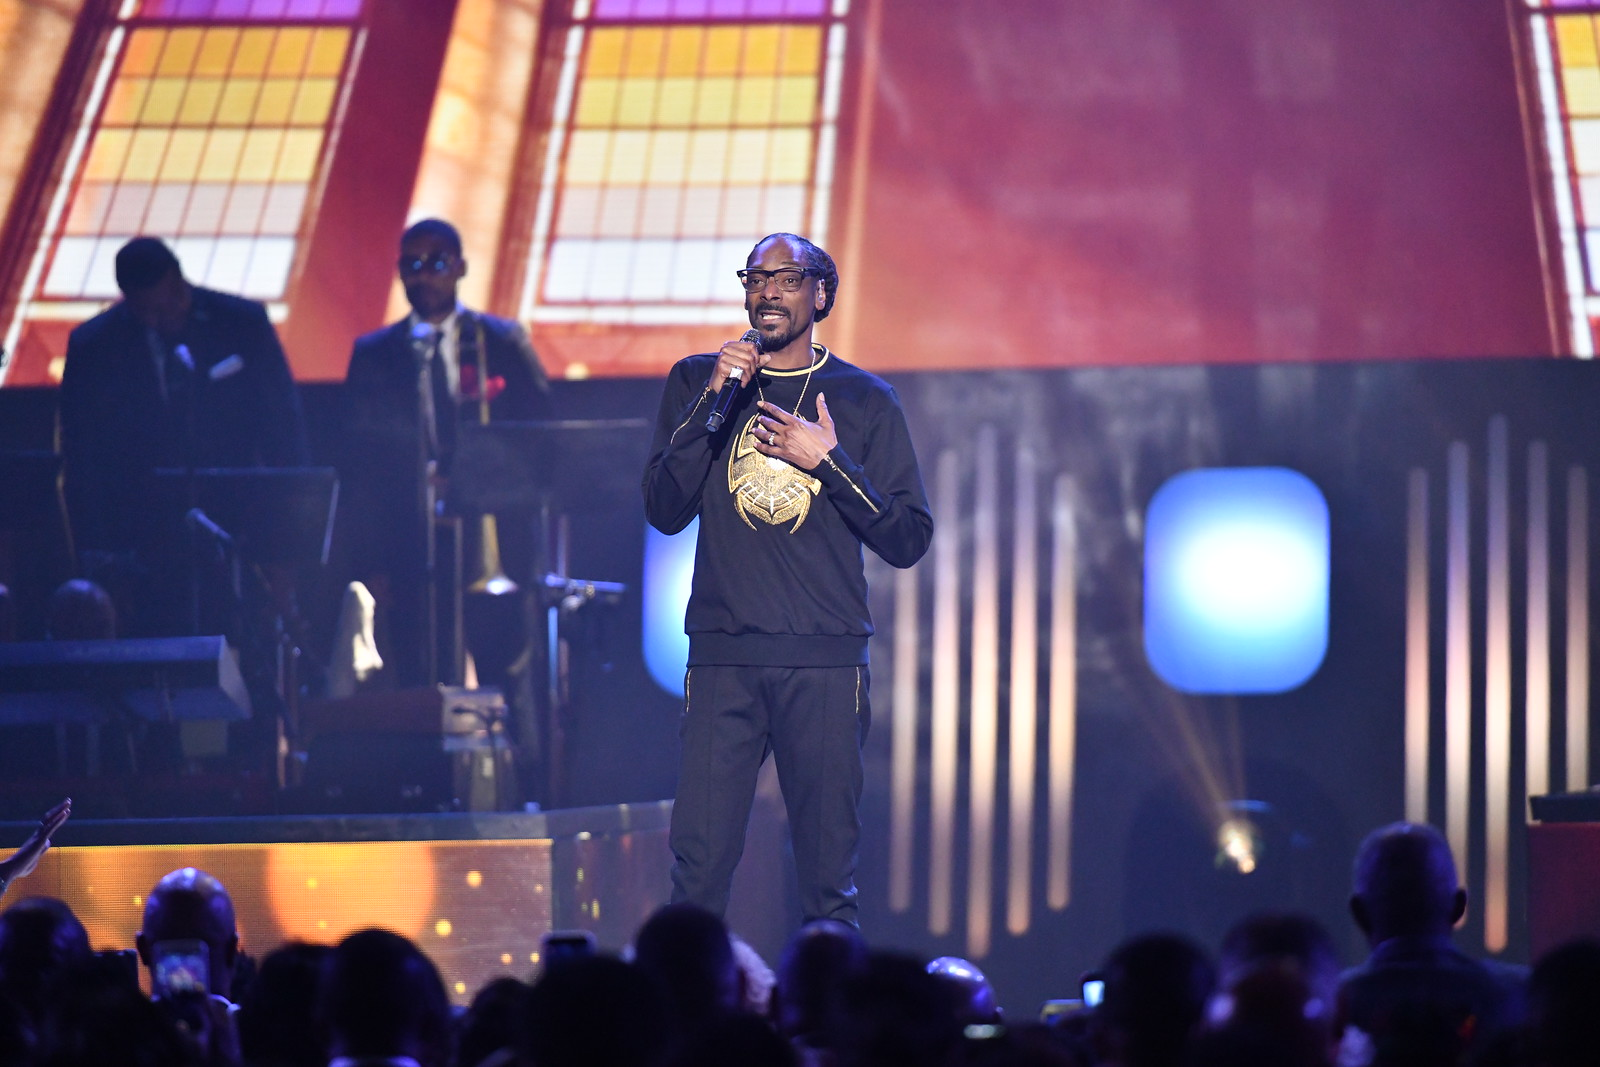 Snoop Dogg Stellar Awards performs 2018.